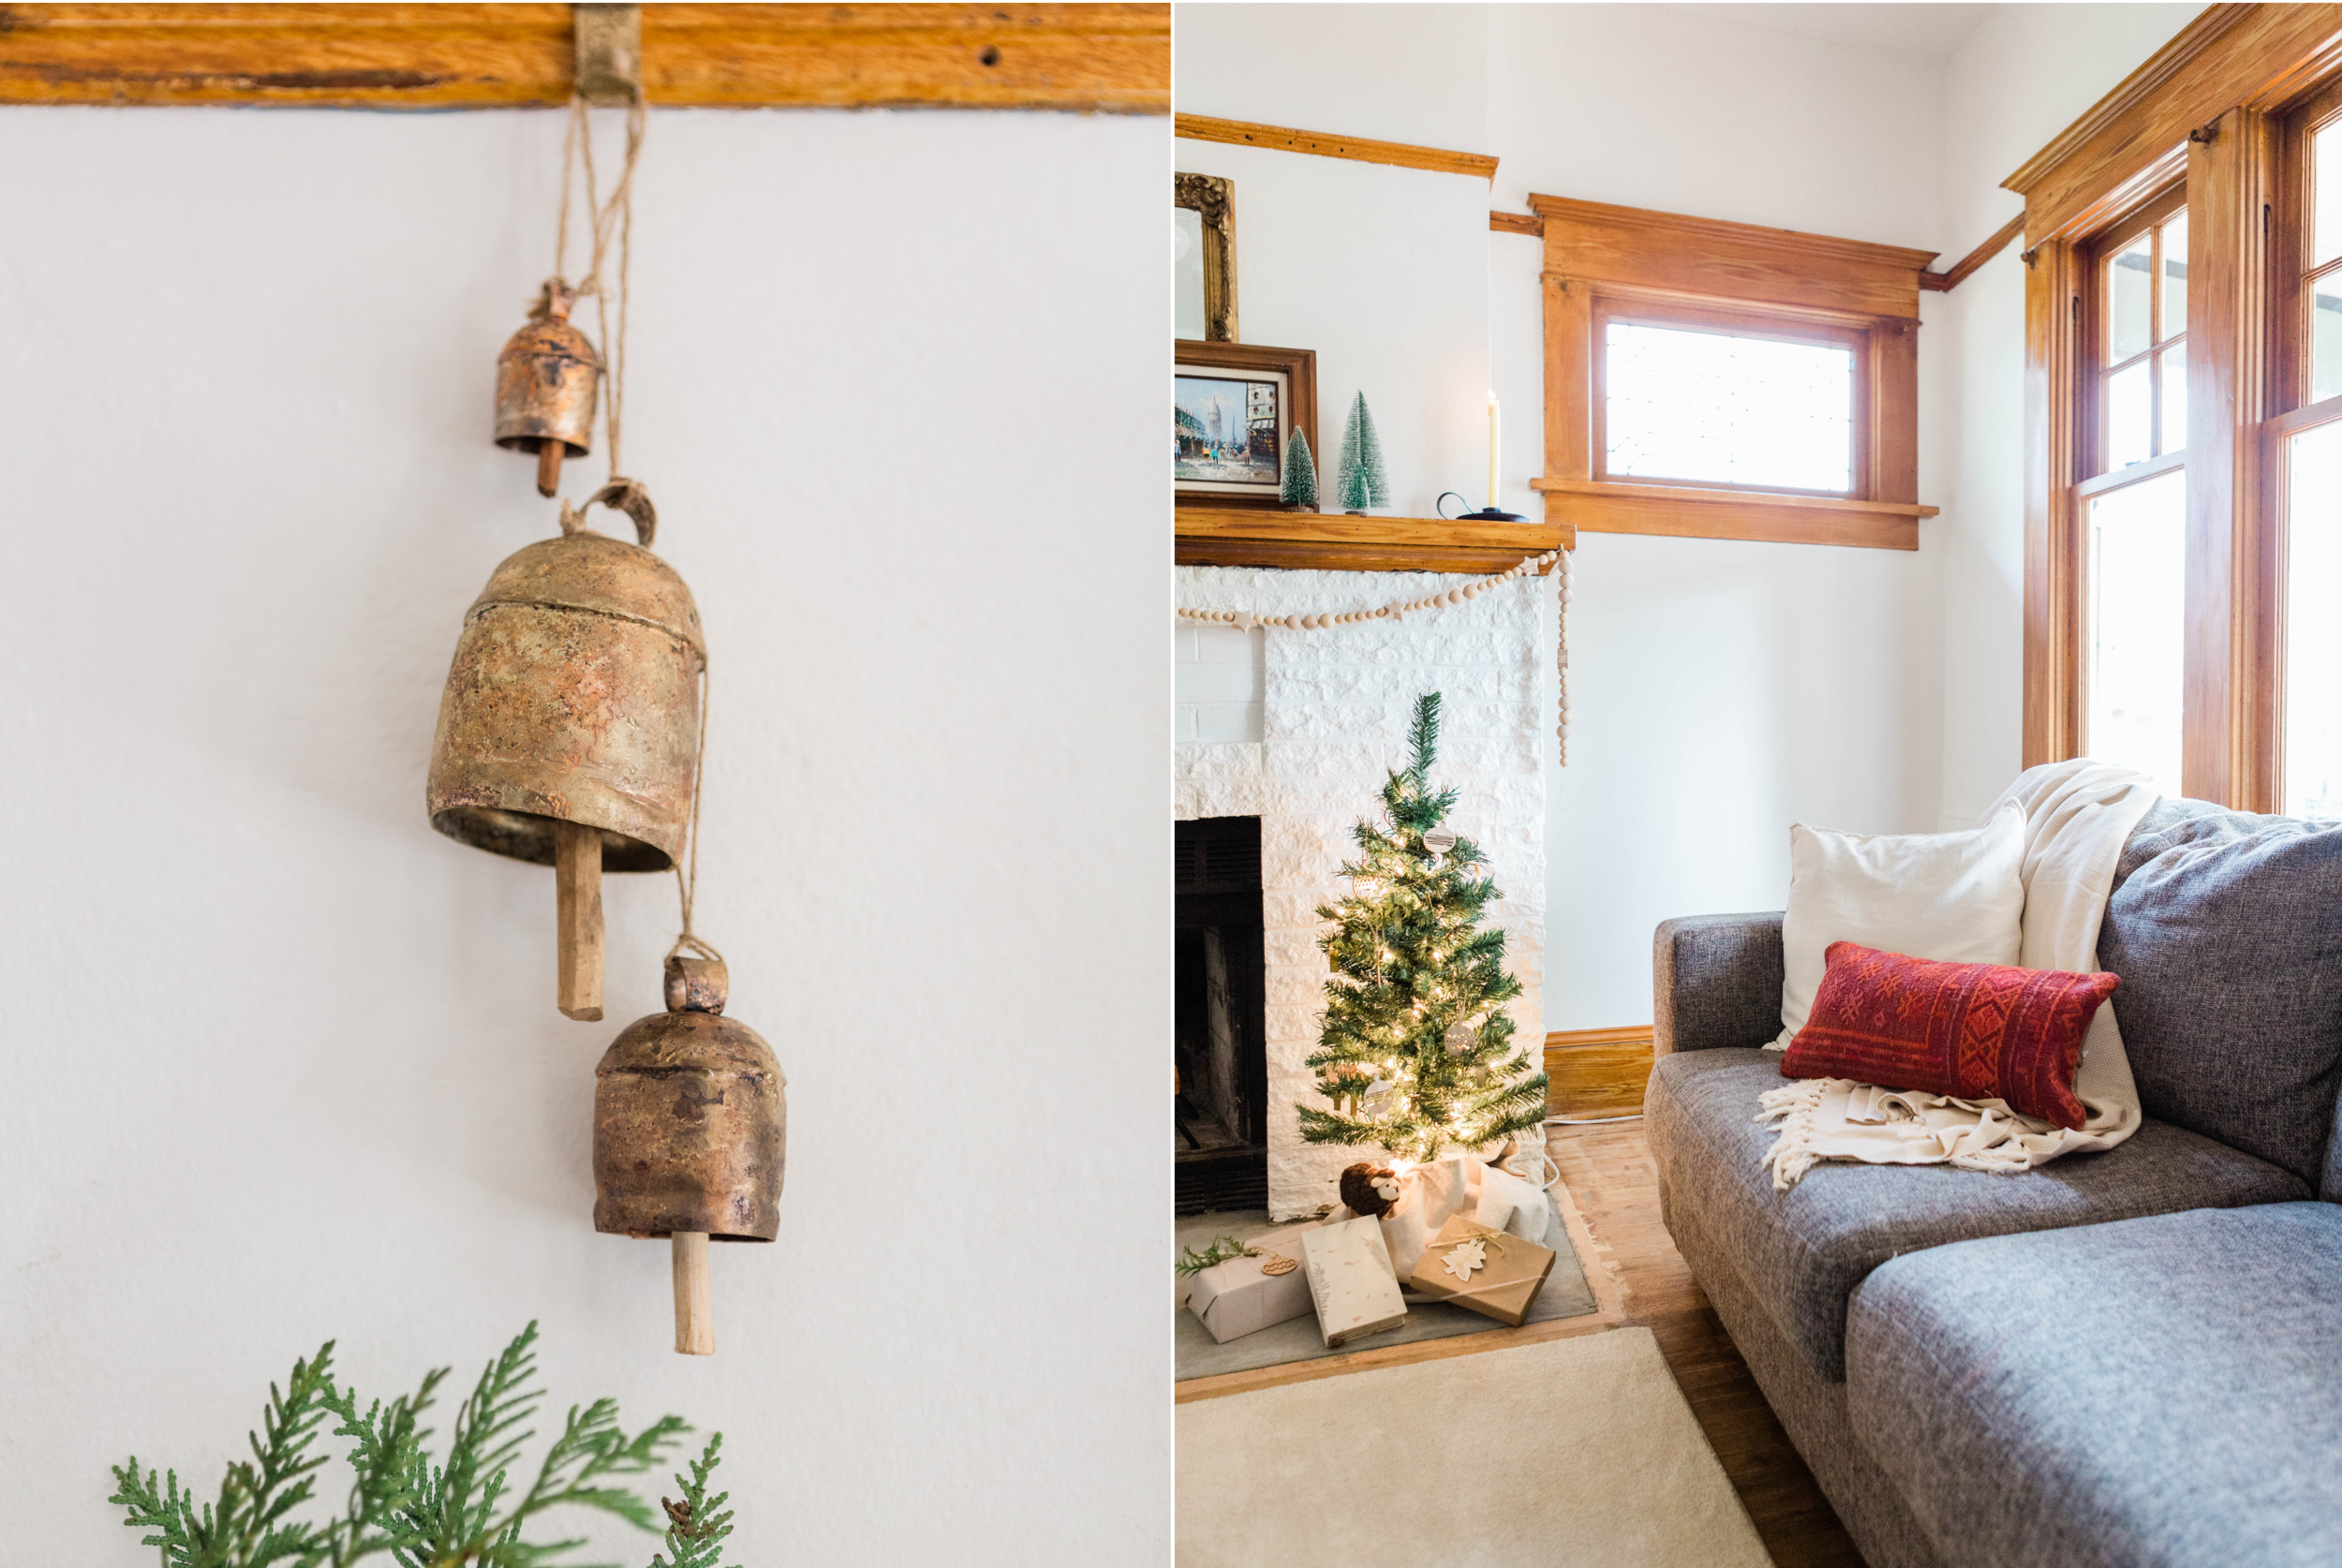 Vintage bells    Rectangle kilim pillow    Herringbone throw blanket    Bottle brush tree    Wood bead garland